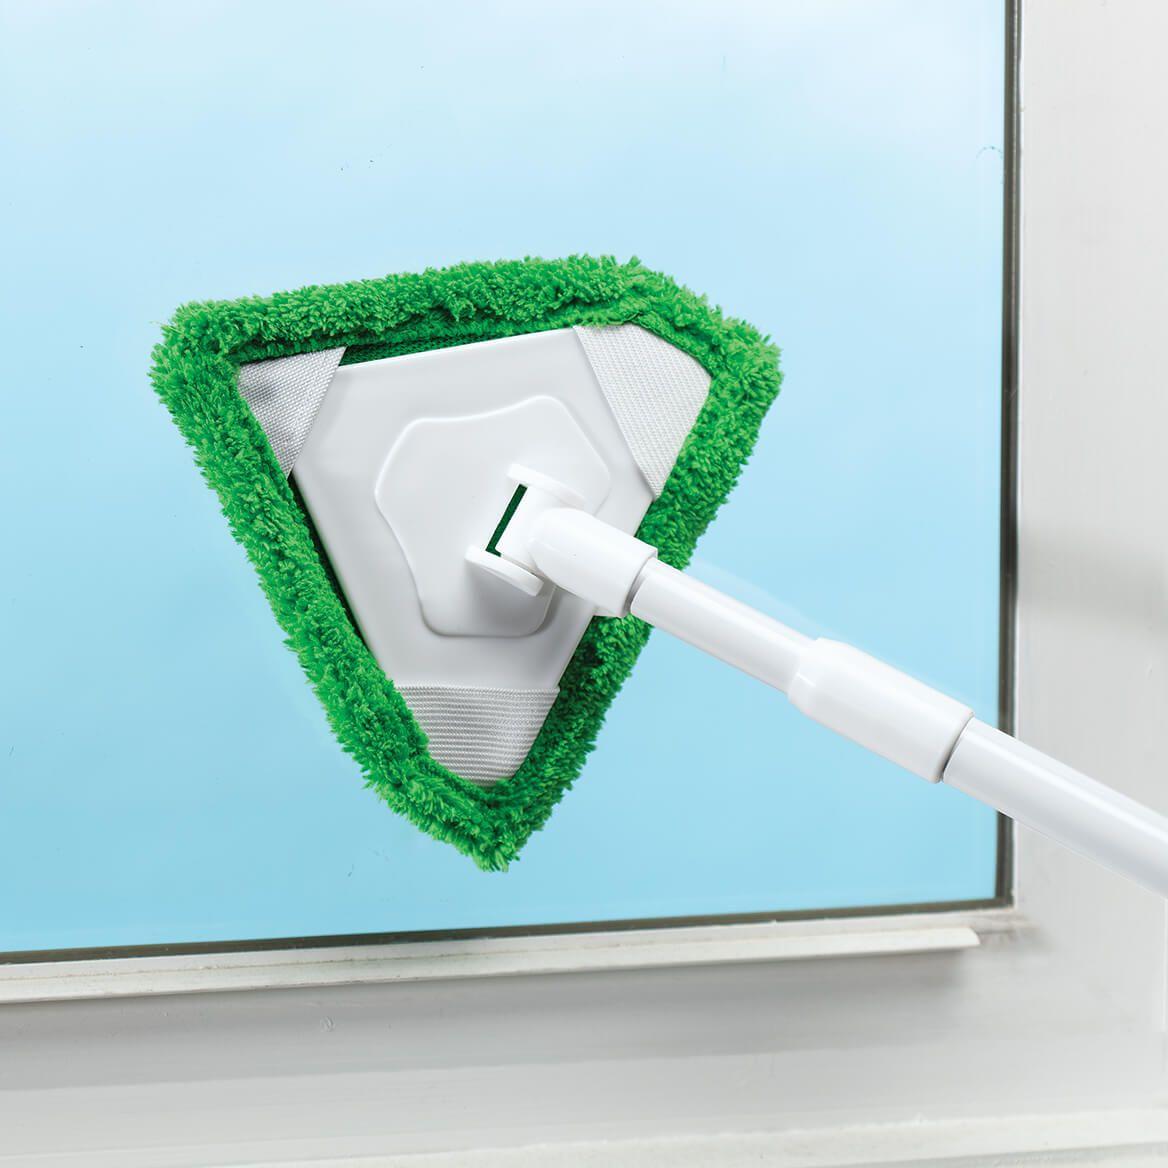 Telescopic Multi-Purpose Triangular Cleaner with 3 Heads-369655